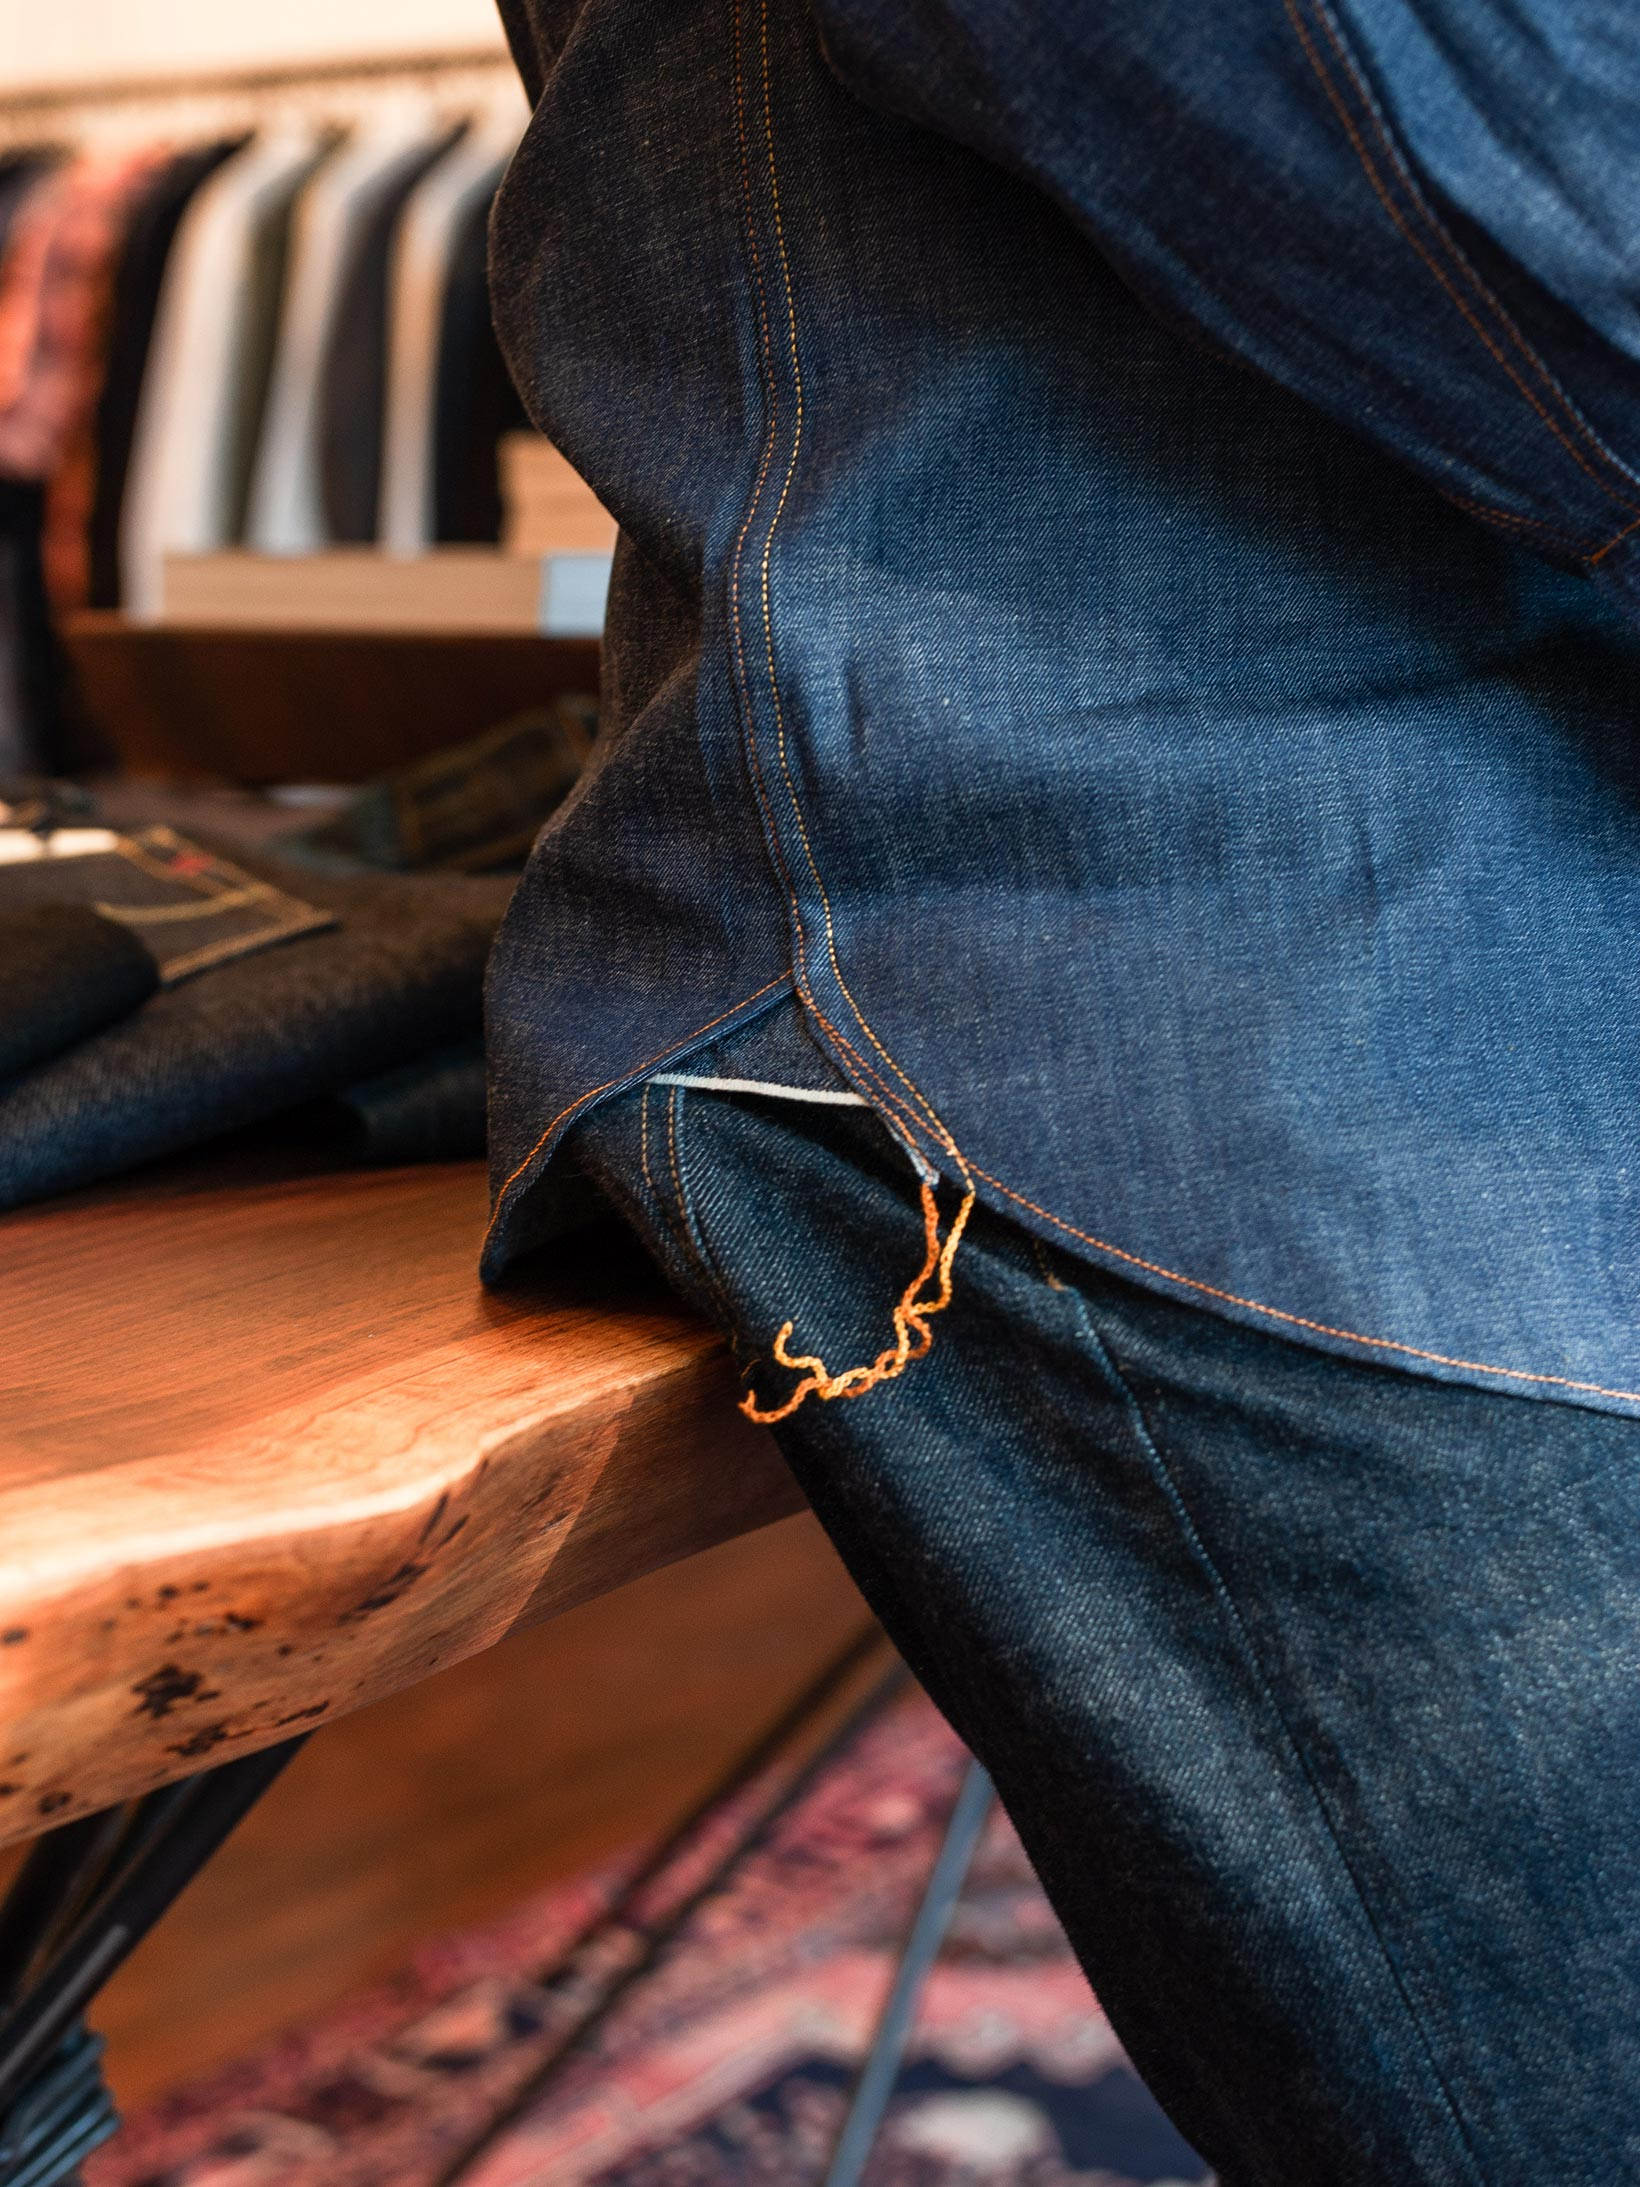 Mister Freedom Dude Rancher Shirt - 101 Indigo Denim - Image 22